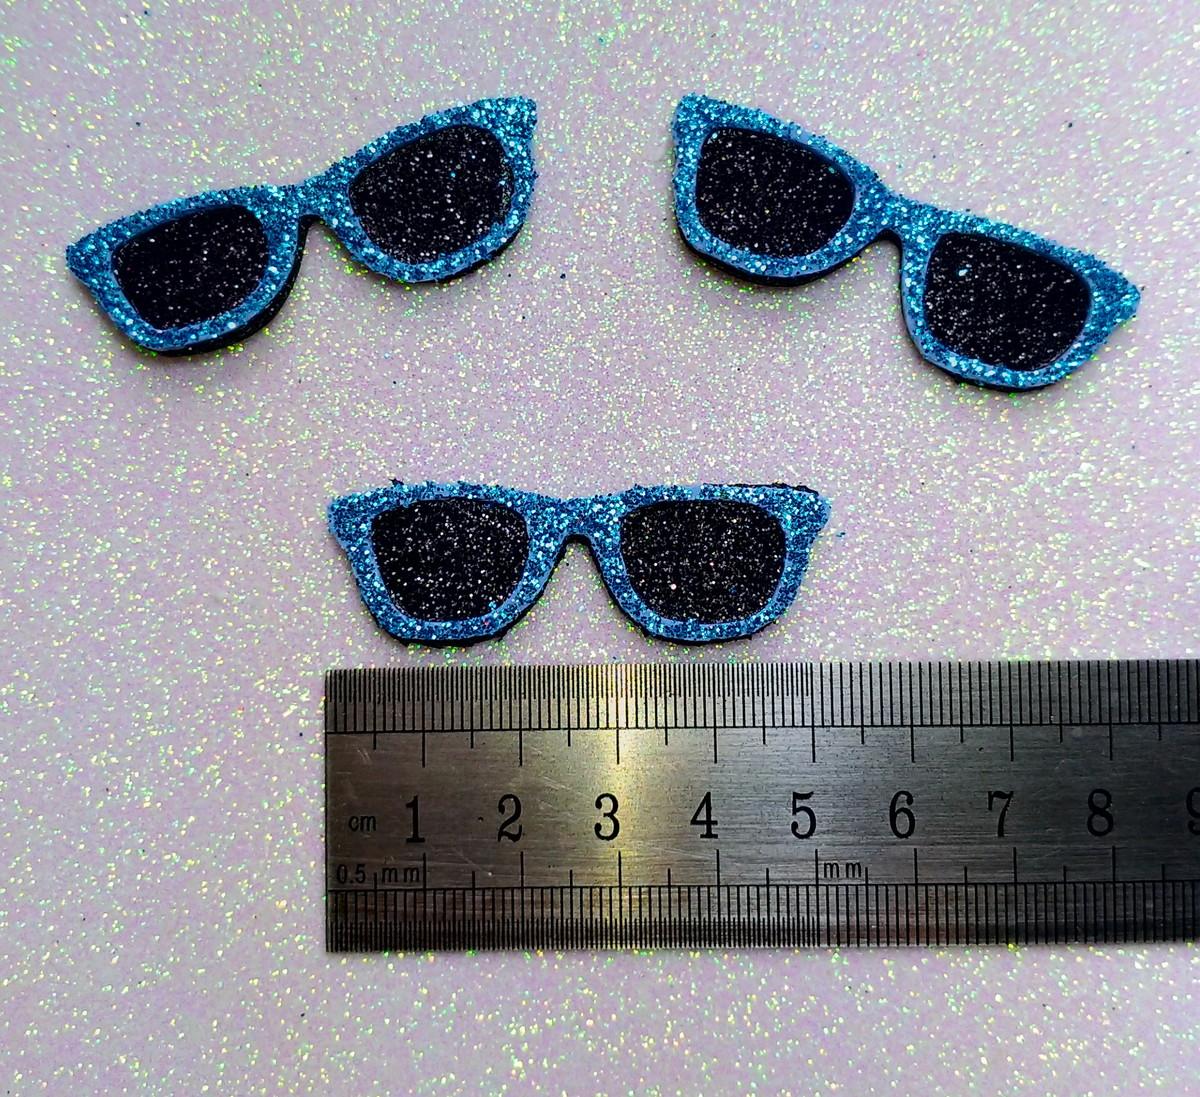 b7efc4b1d87e9 Óculos de Sol - EVA (Azul Glitter) no Elo7